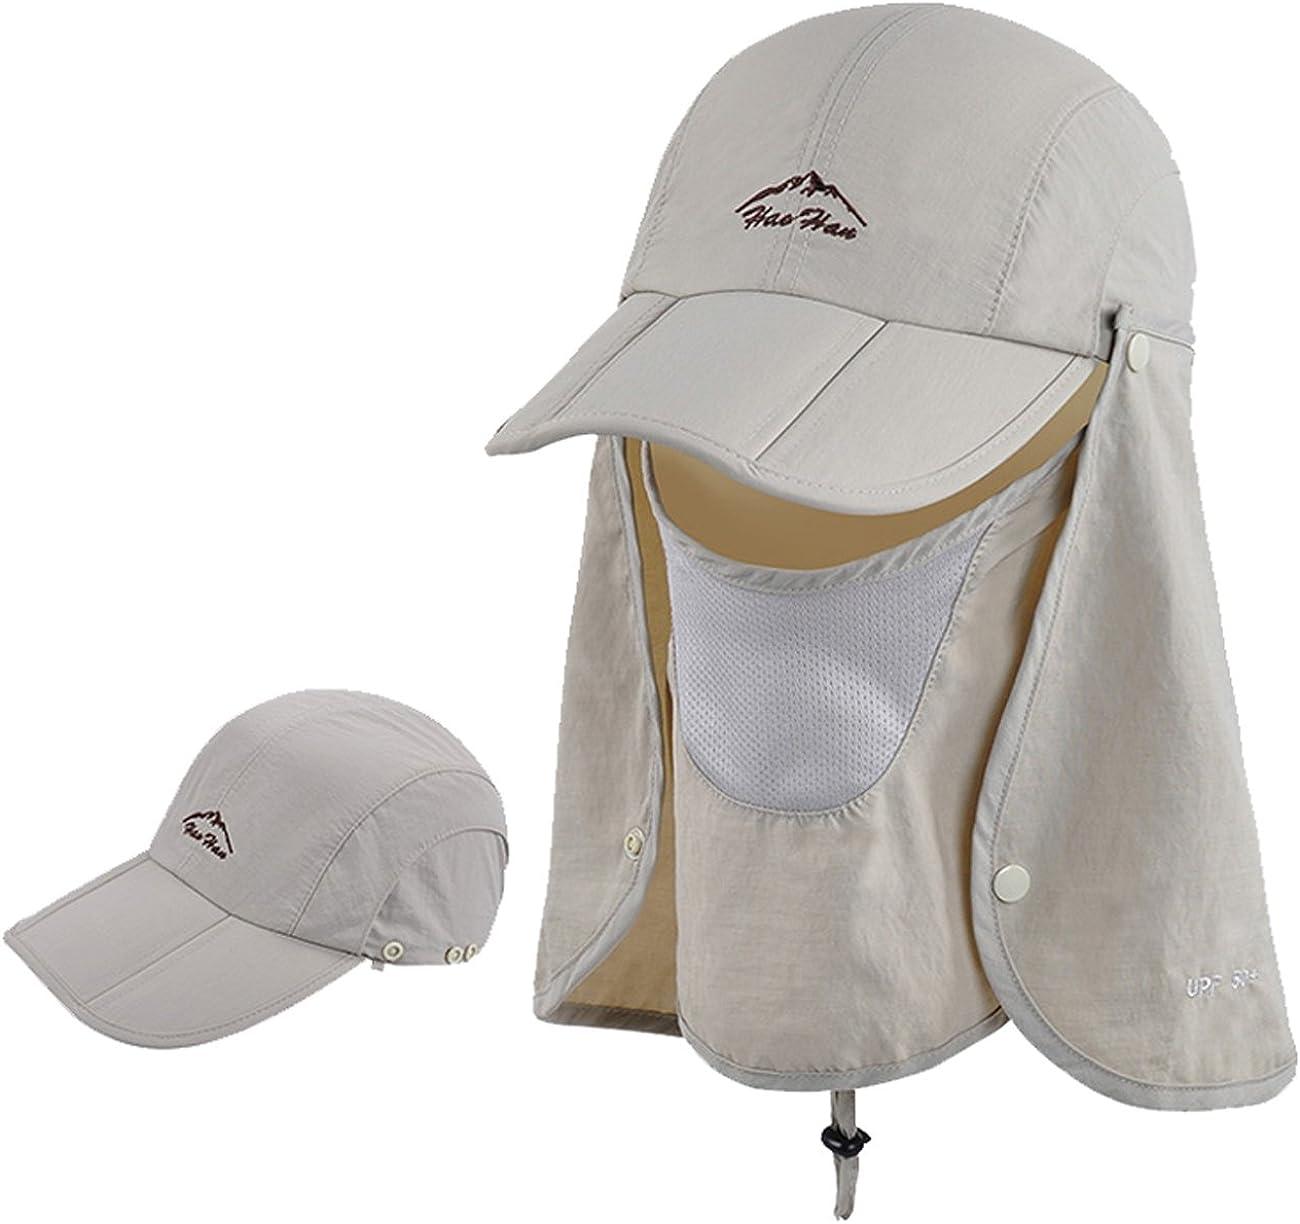 Epsion Women Summer Neck Flap Sun Visor/Hats Wide Brim UV Protection UPF 50+ Hiking Cap Adjustable